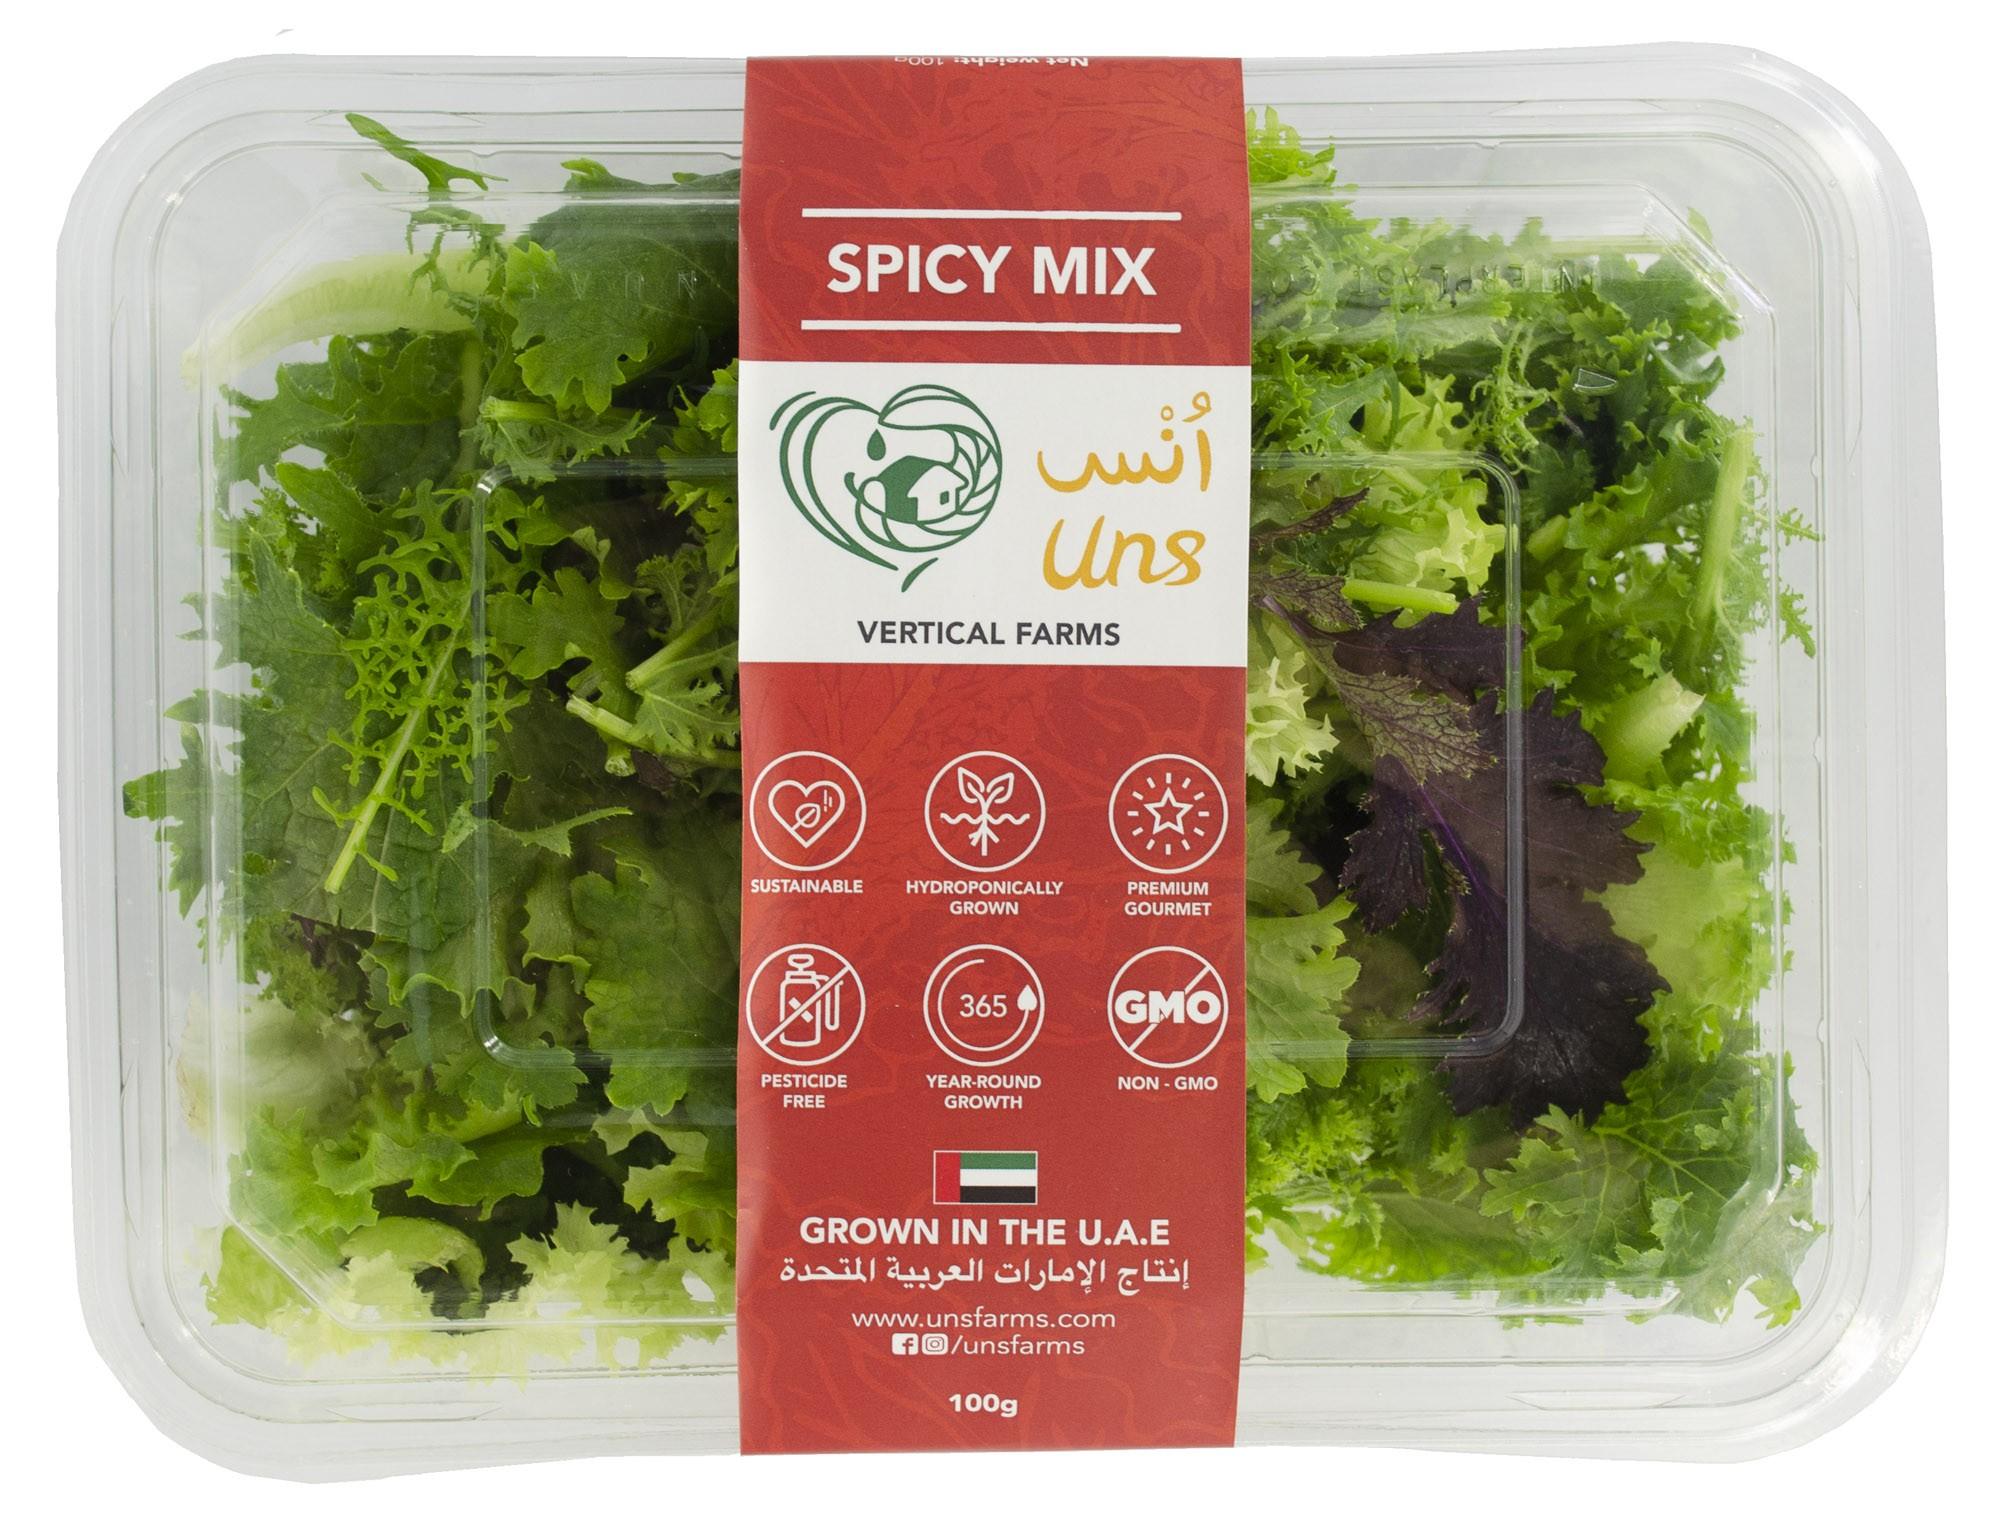 Spicy Mix